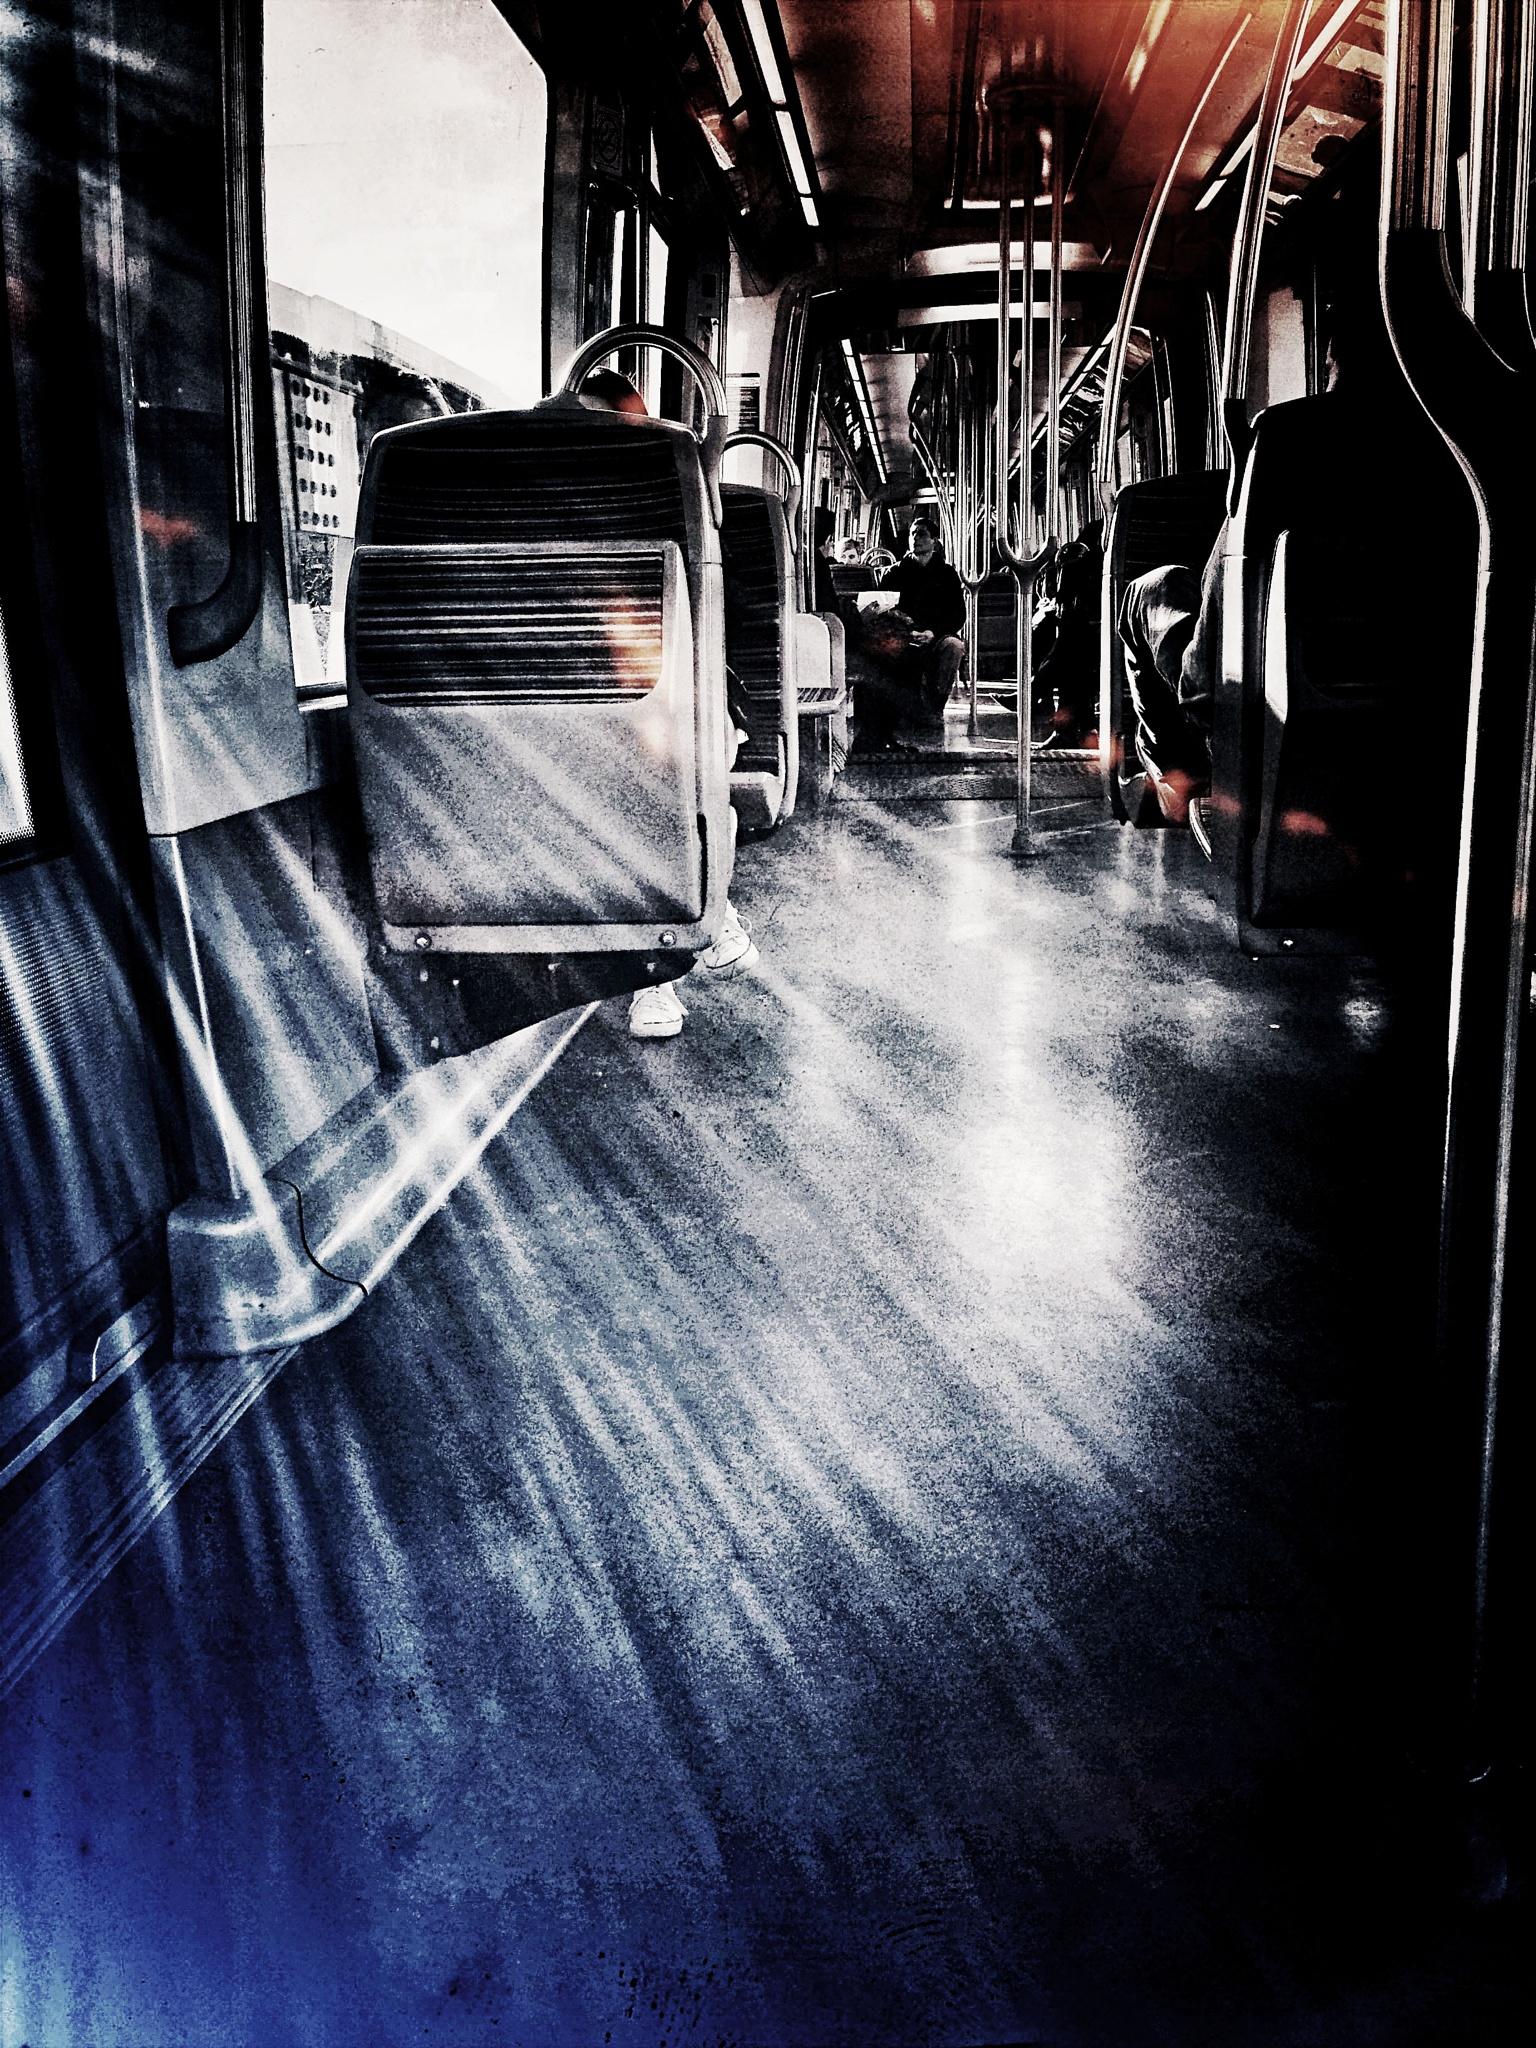 Parisian tube by FUMIGRAPHIK